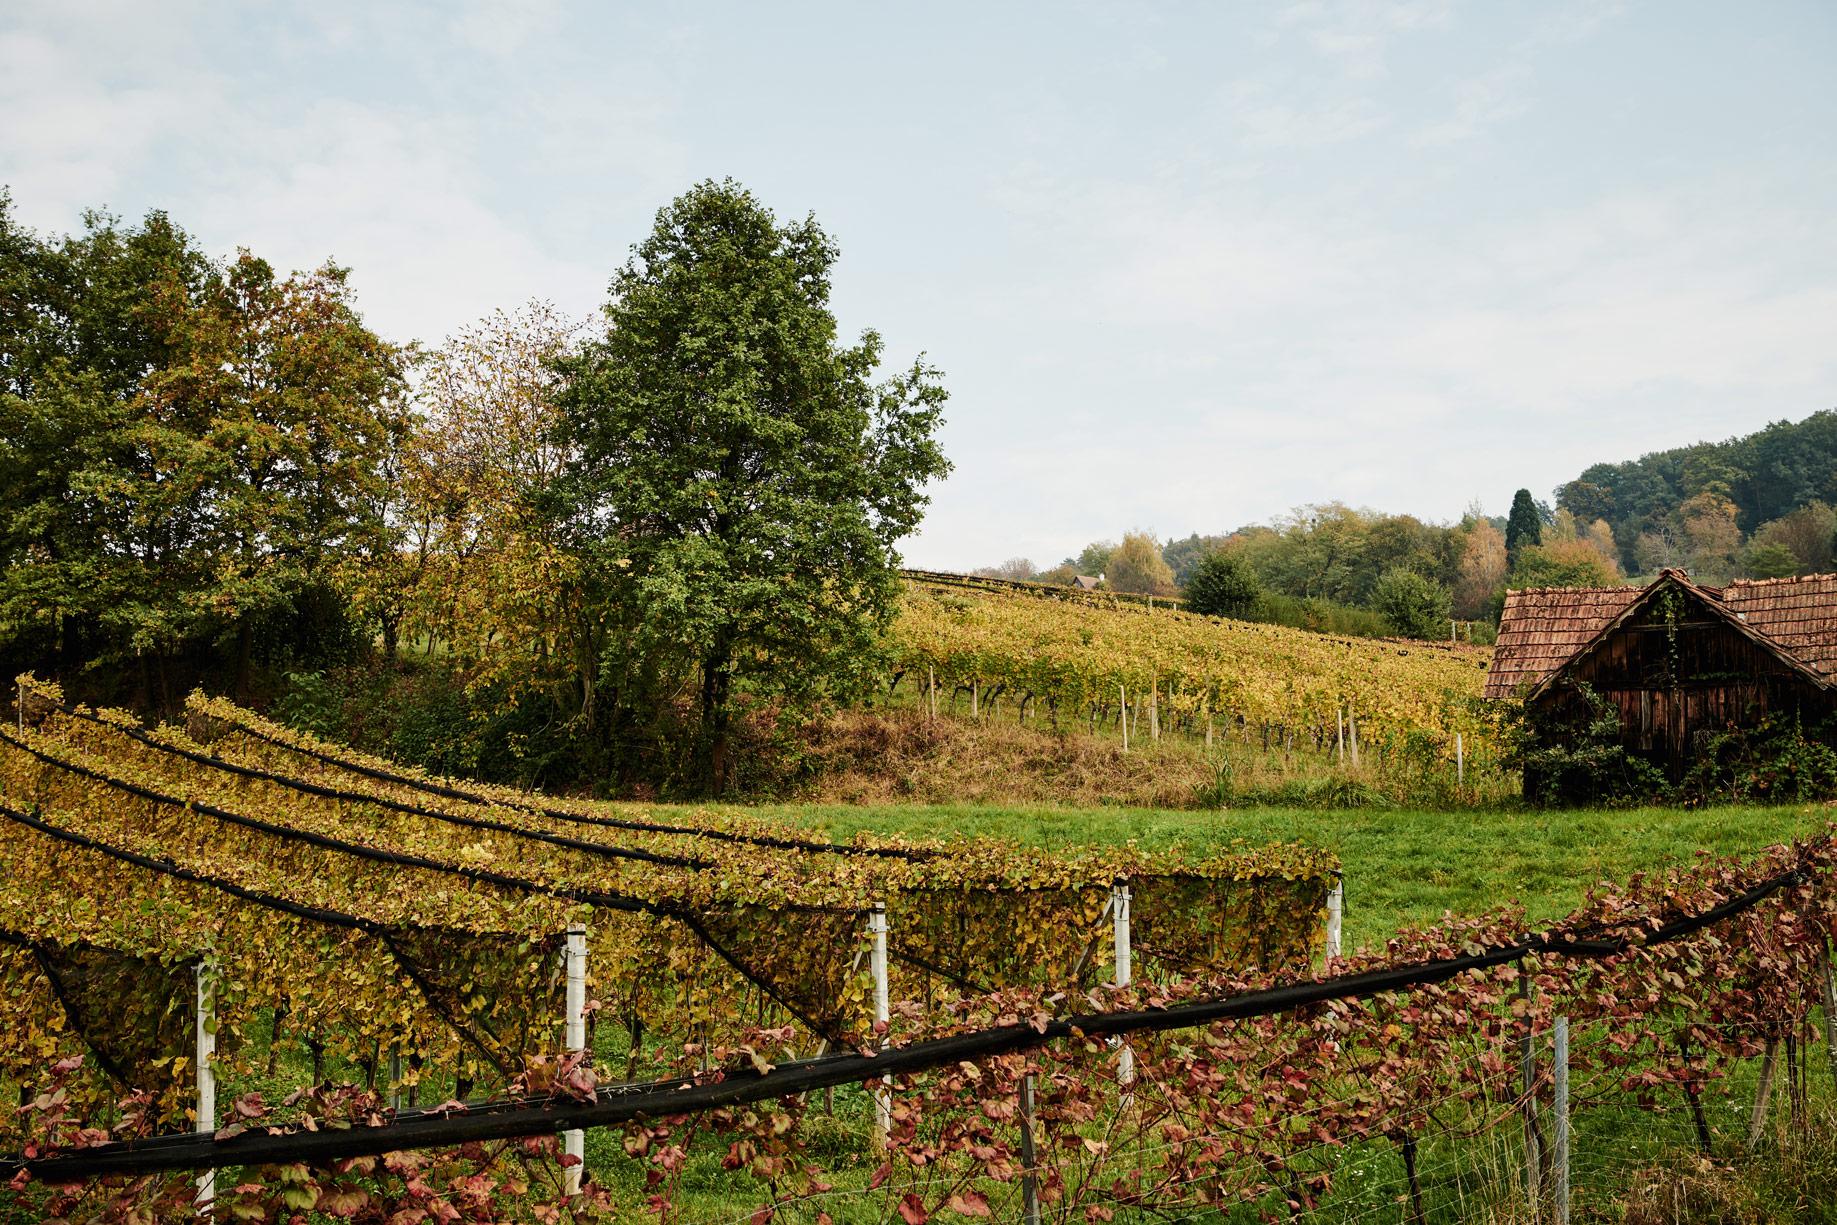 stk-wein-frauwallner-wine-nature-grapes-trees